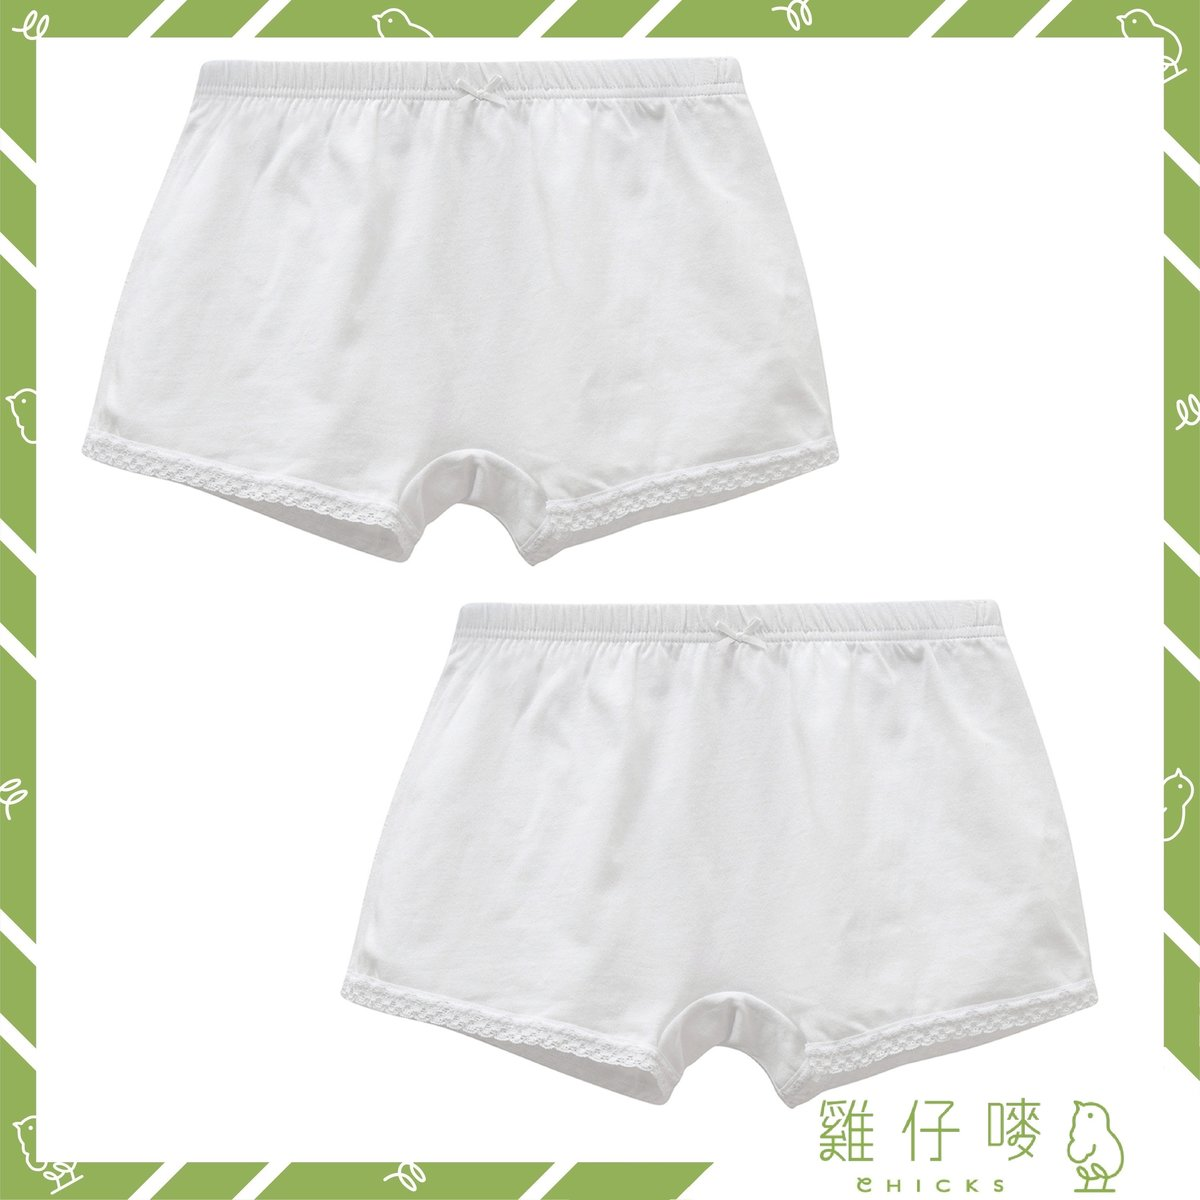 Cotton Paradise - Girl's Boxer (2pc/pack) (White) (Size 100cm)